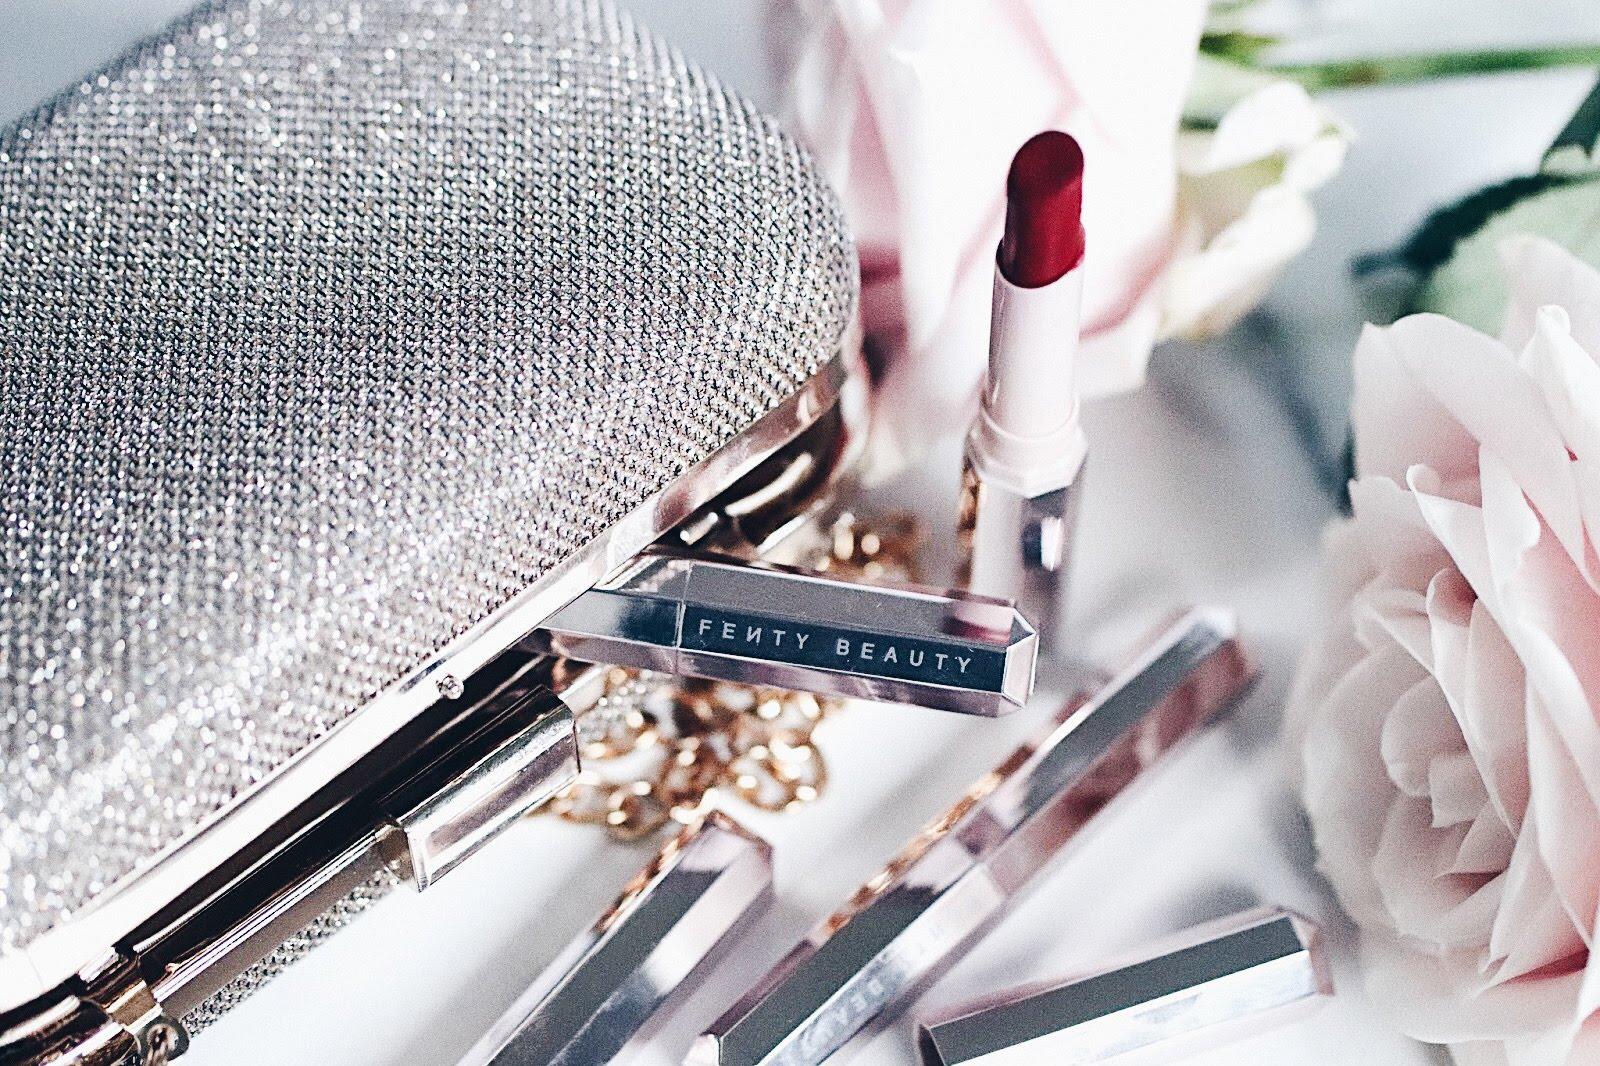 fenty beauty by rihanna mattemoiselle rouge à lèvres mat avis test swatches